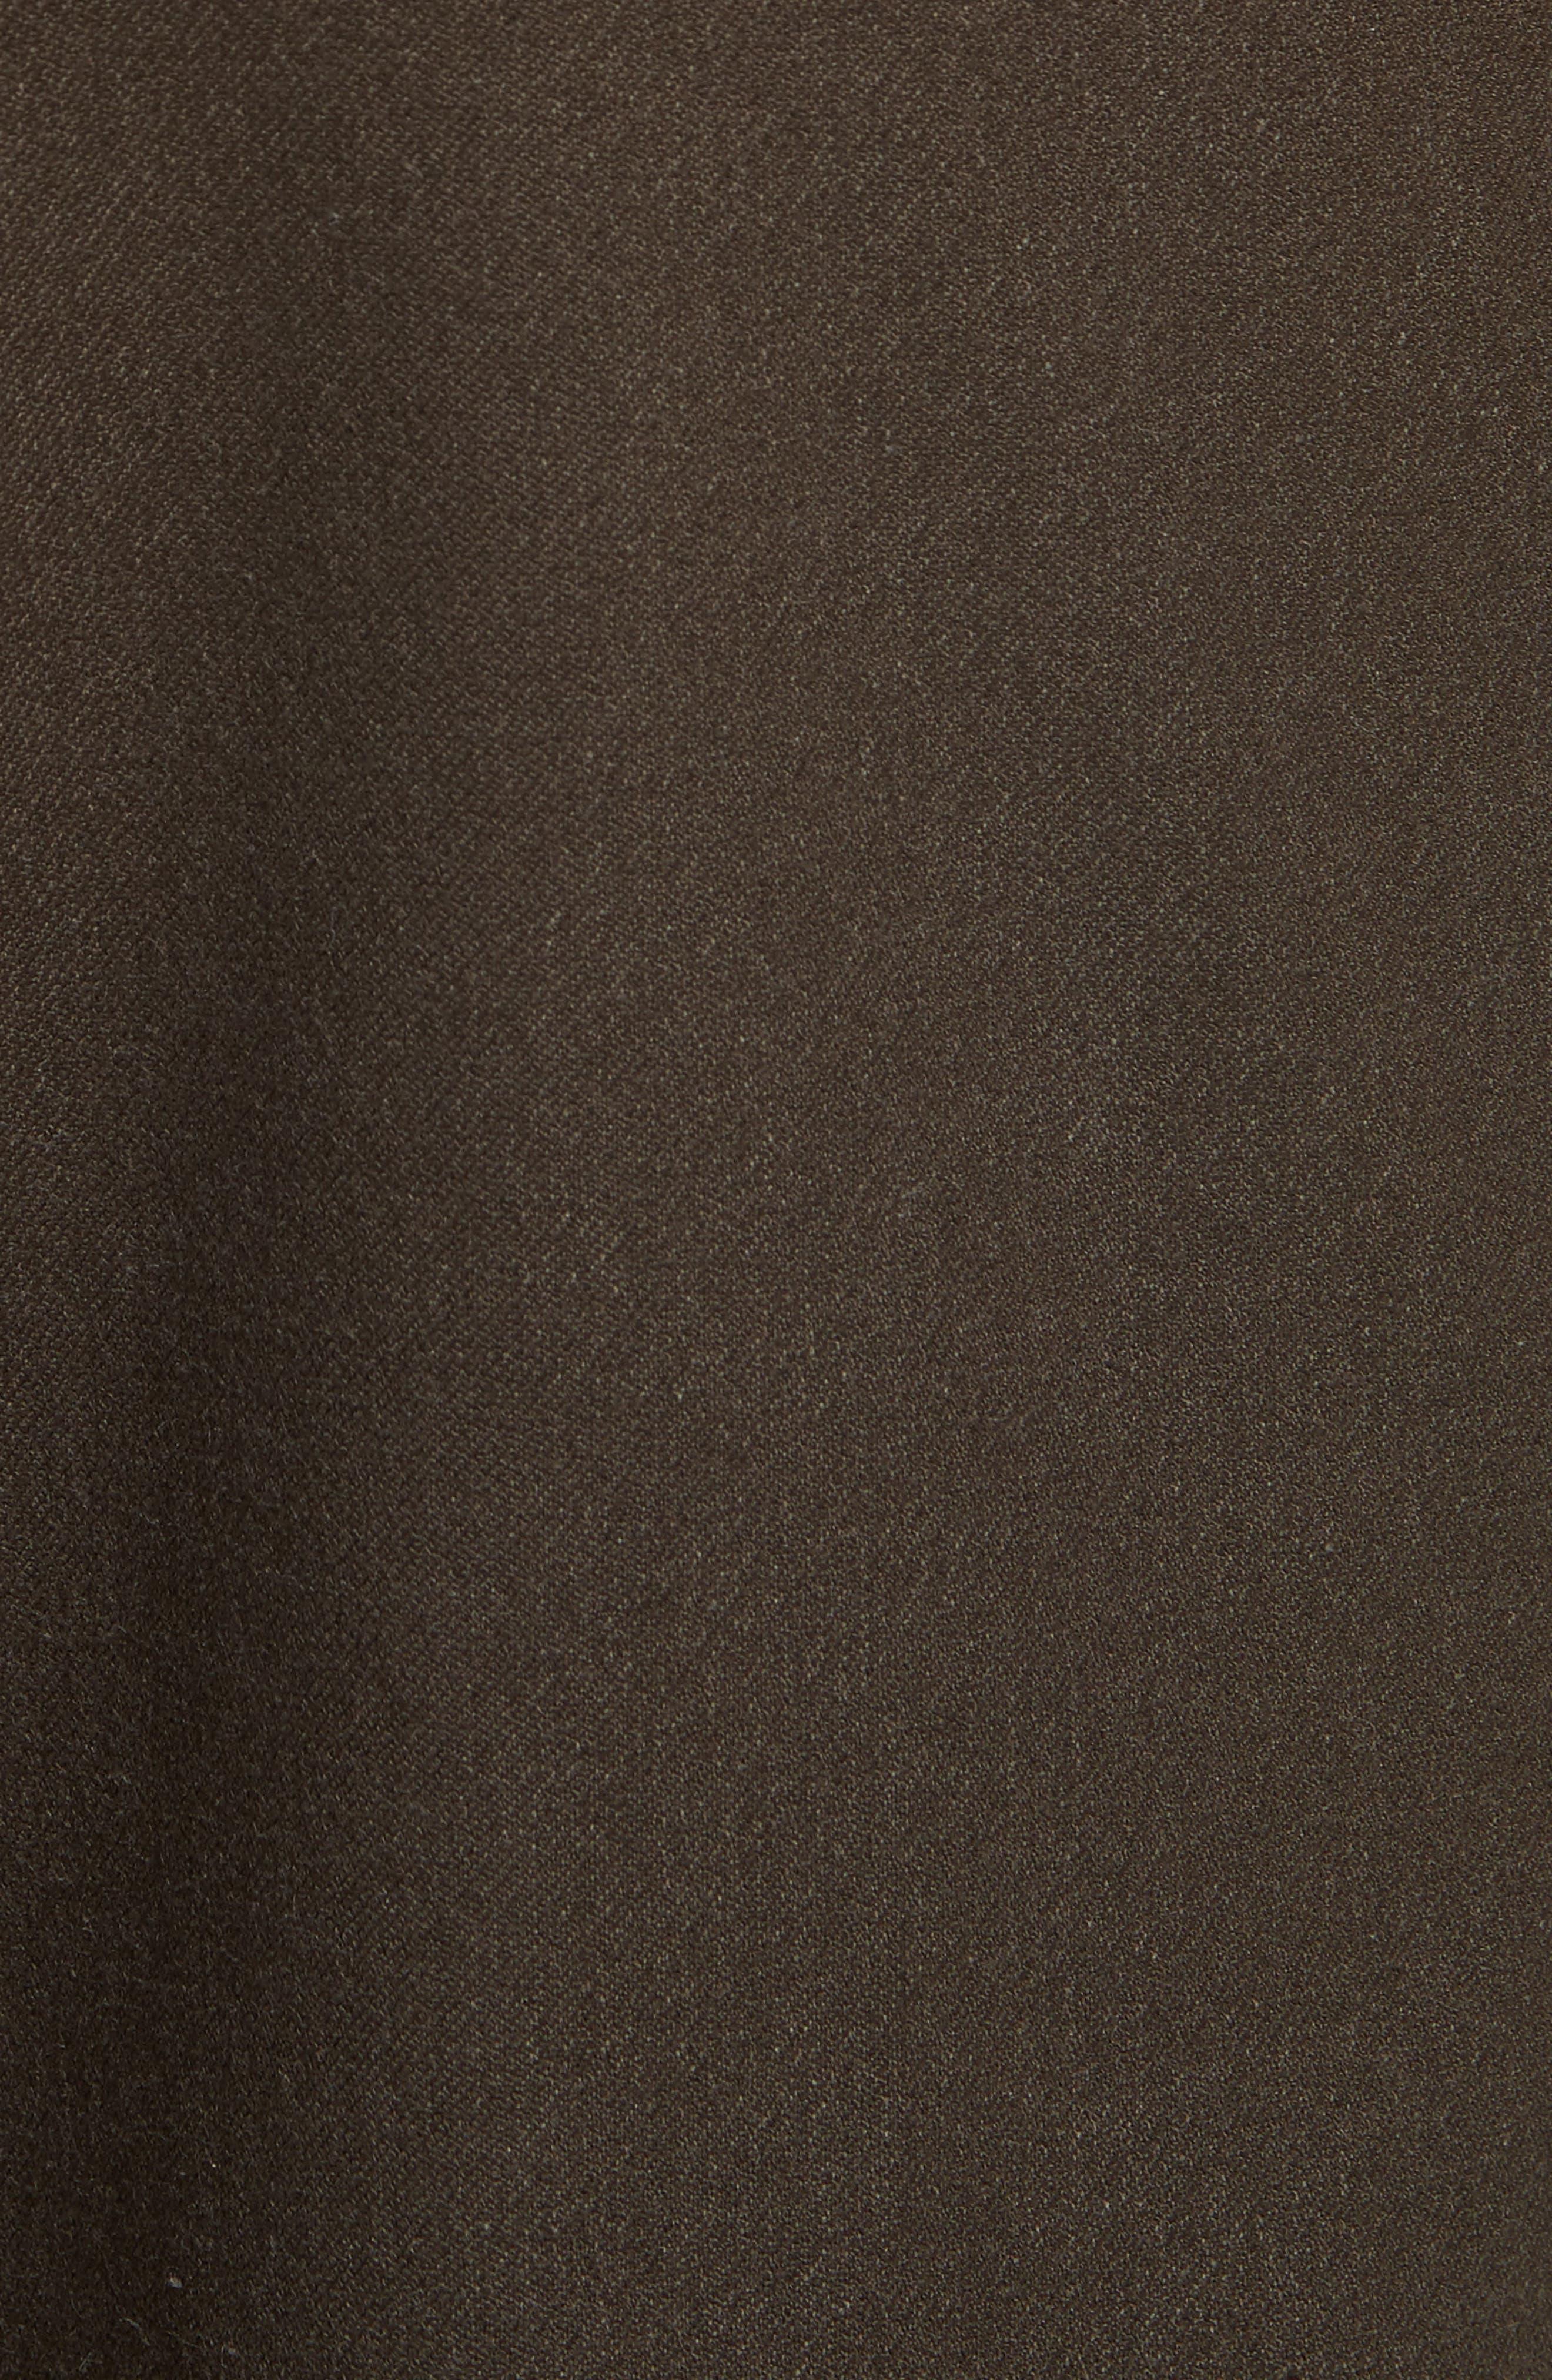 New Tony Gabardine Crop Pants,                             Alternate thumbnail 5, color,                             Chocolate